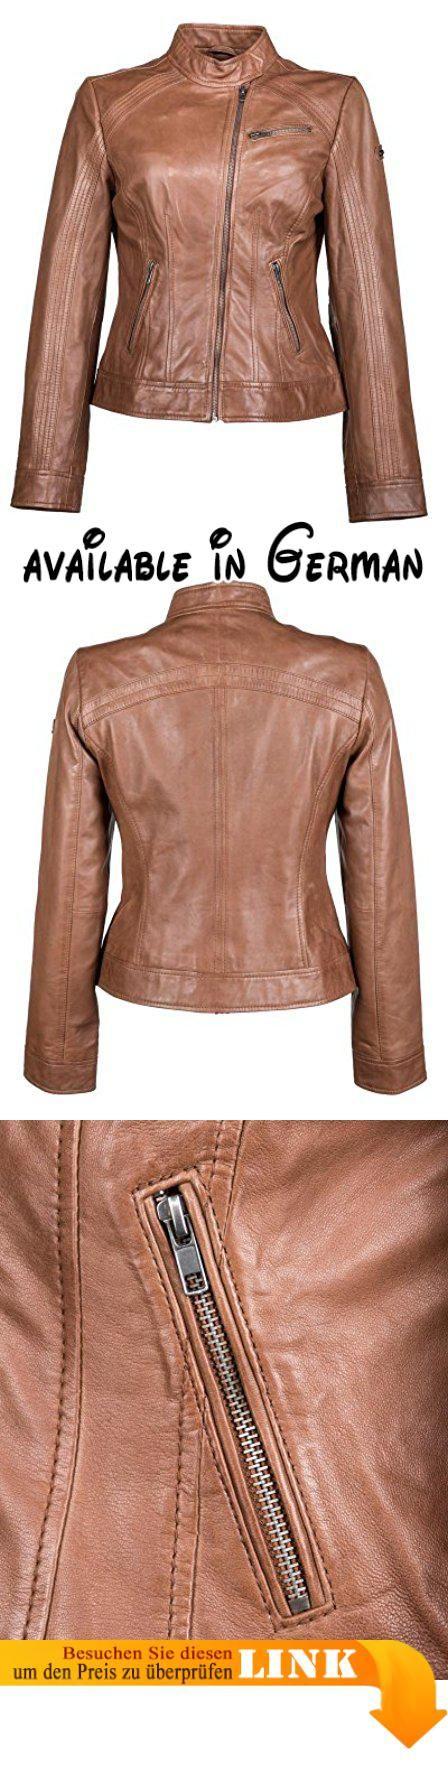 B00JENLHLU : JCC Lederjacke Damen. Trendige Damen Lederjacke im Bikerstil. weiches Lammleder. viele Details. cooles Design. Farbe: brown #Apparel #OUTERWEAR